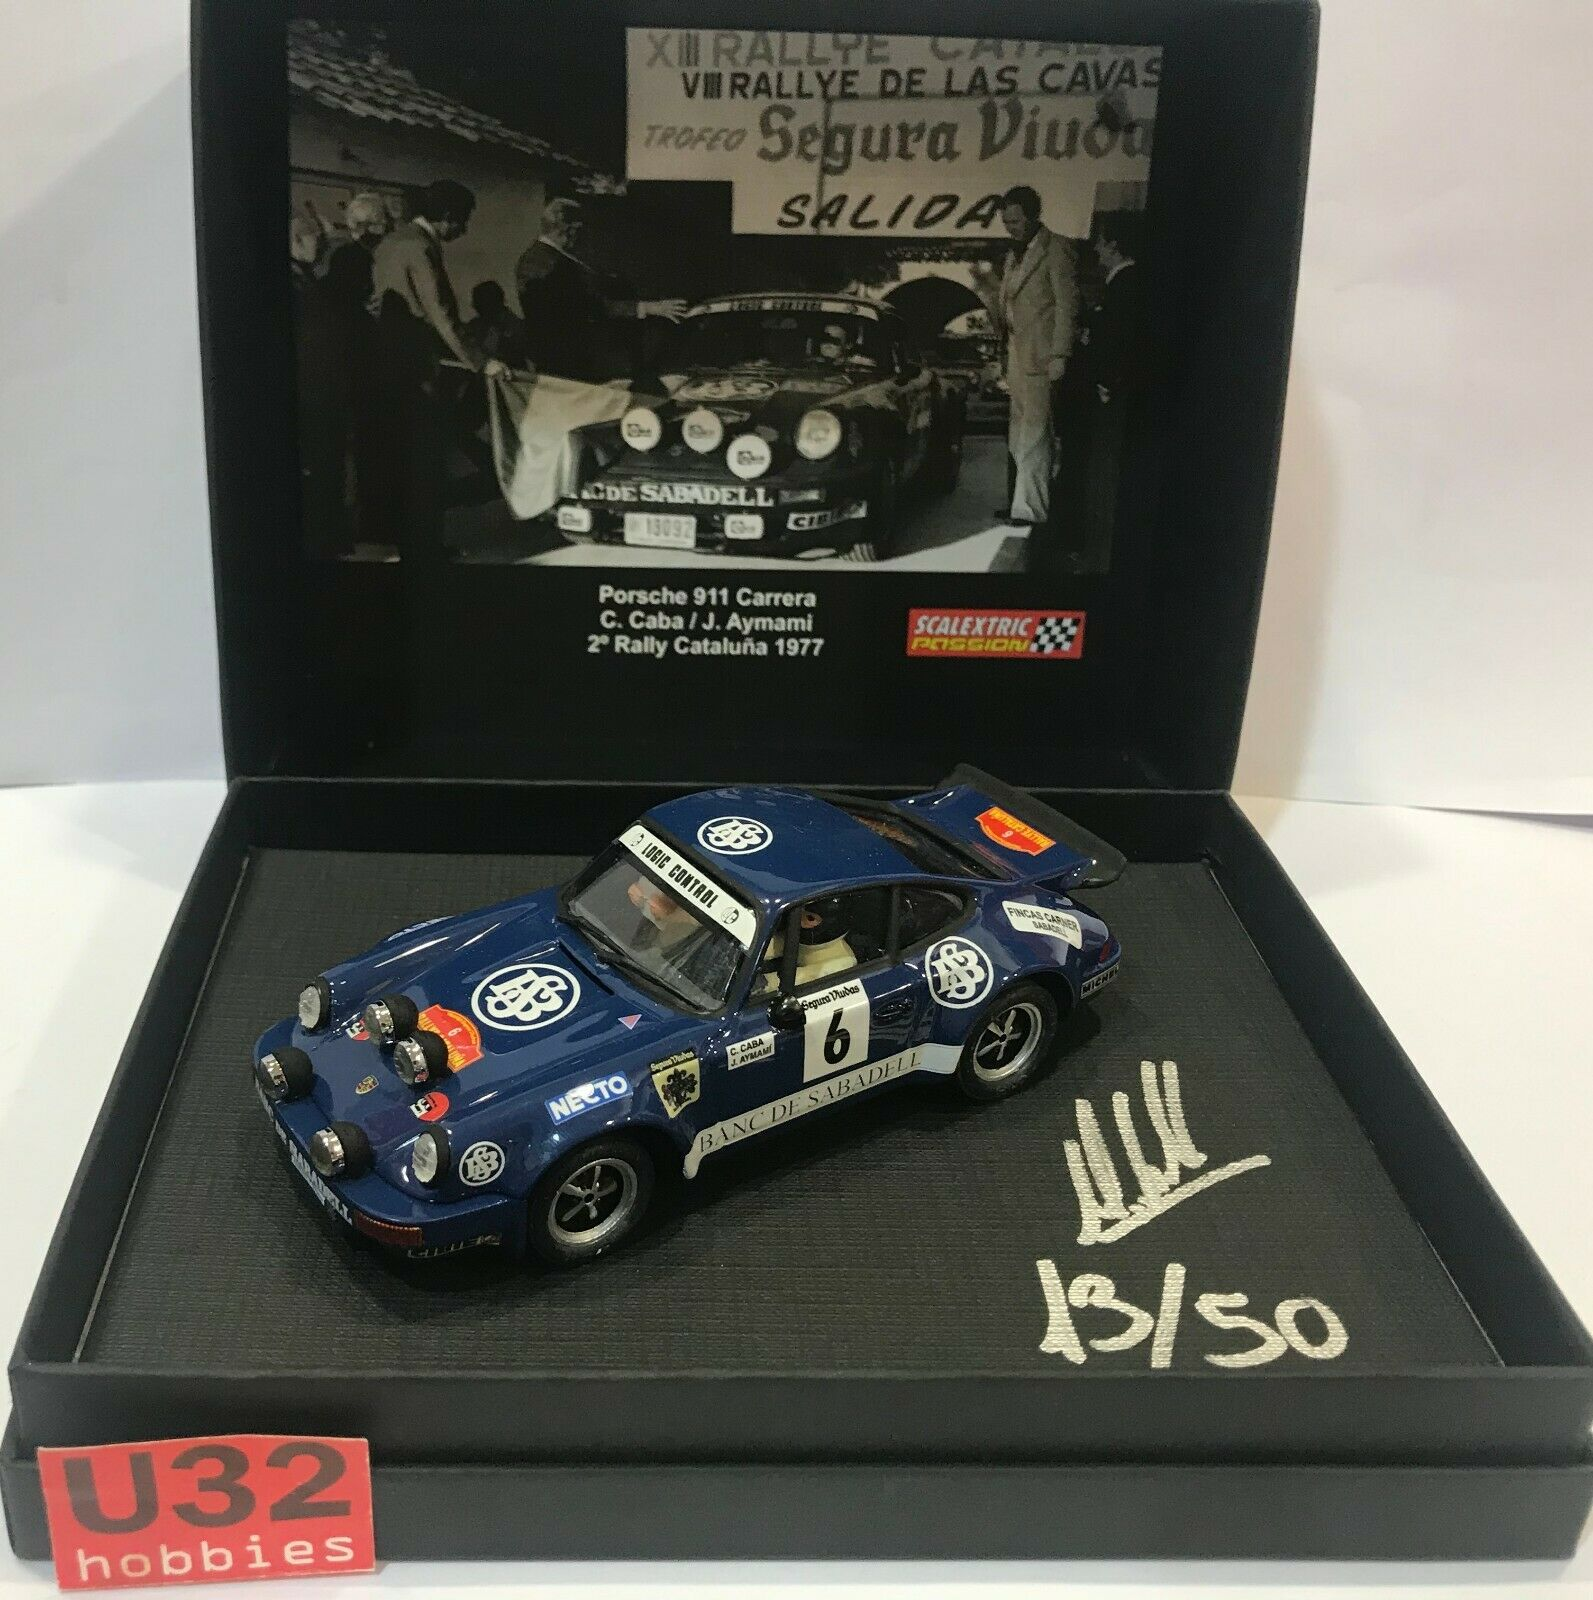 Scalextric Passion SP034 Porsche 911 Carrera  6 2º Rally Catalunya 1977 C. Caba